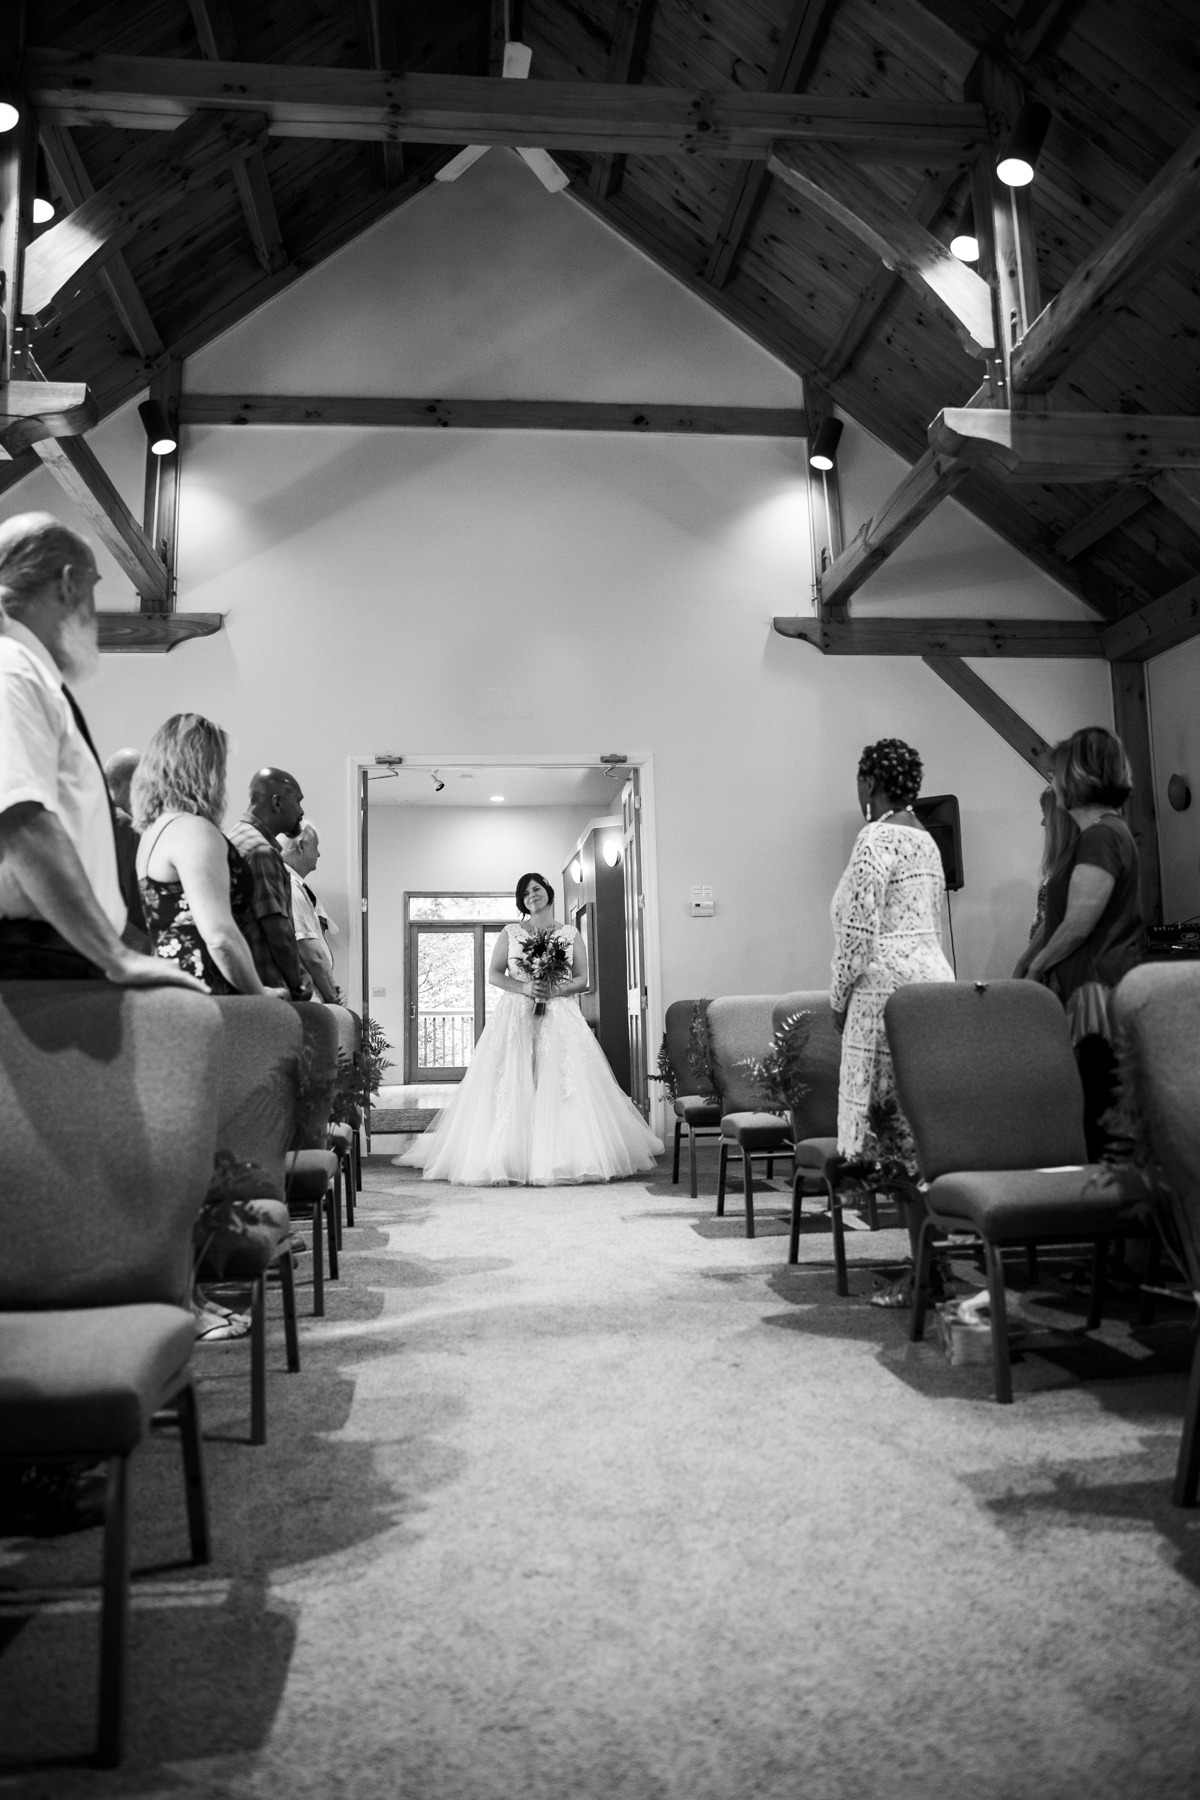 Avyanna and Phoenix Wedding- Photos by Studio Misha_BLOG-47.jpg